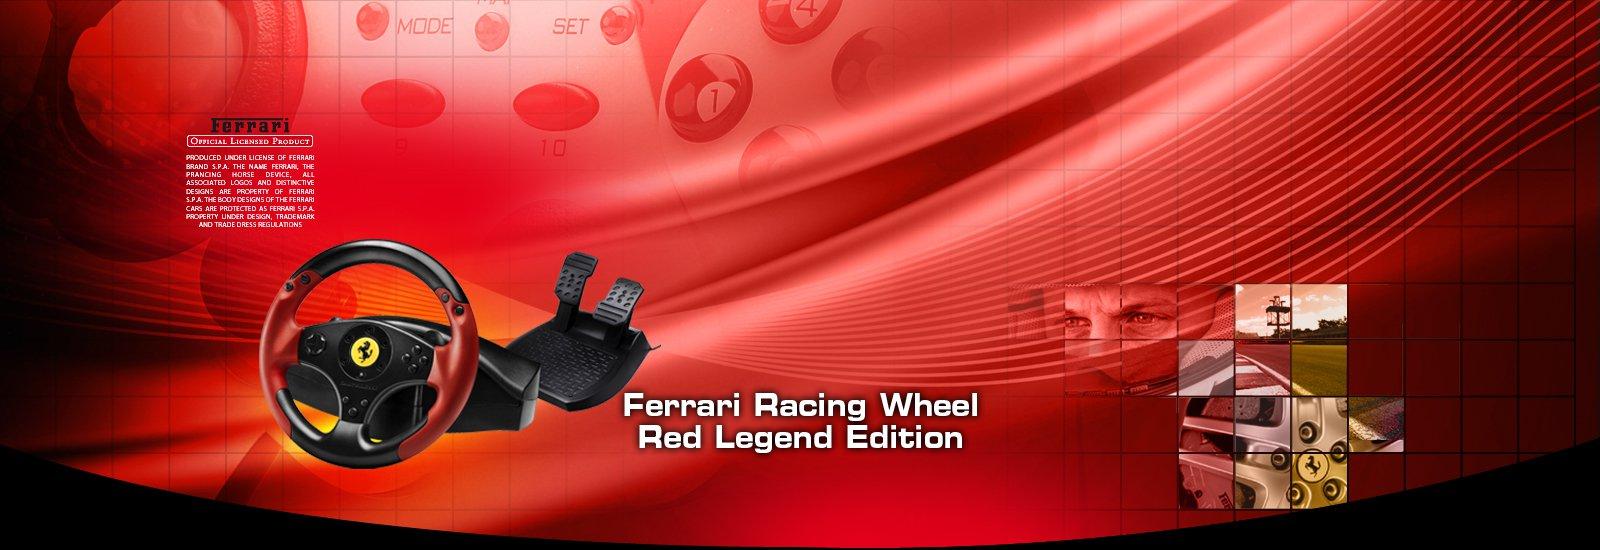 ferrari racing wheel red legend édition